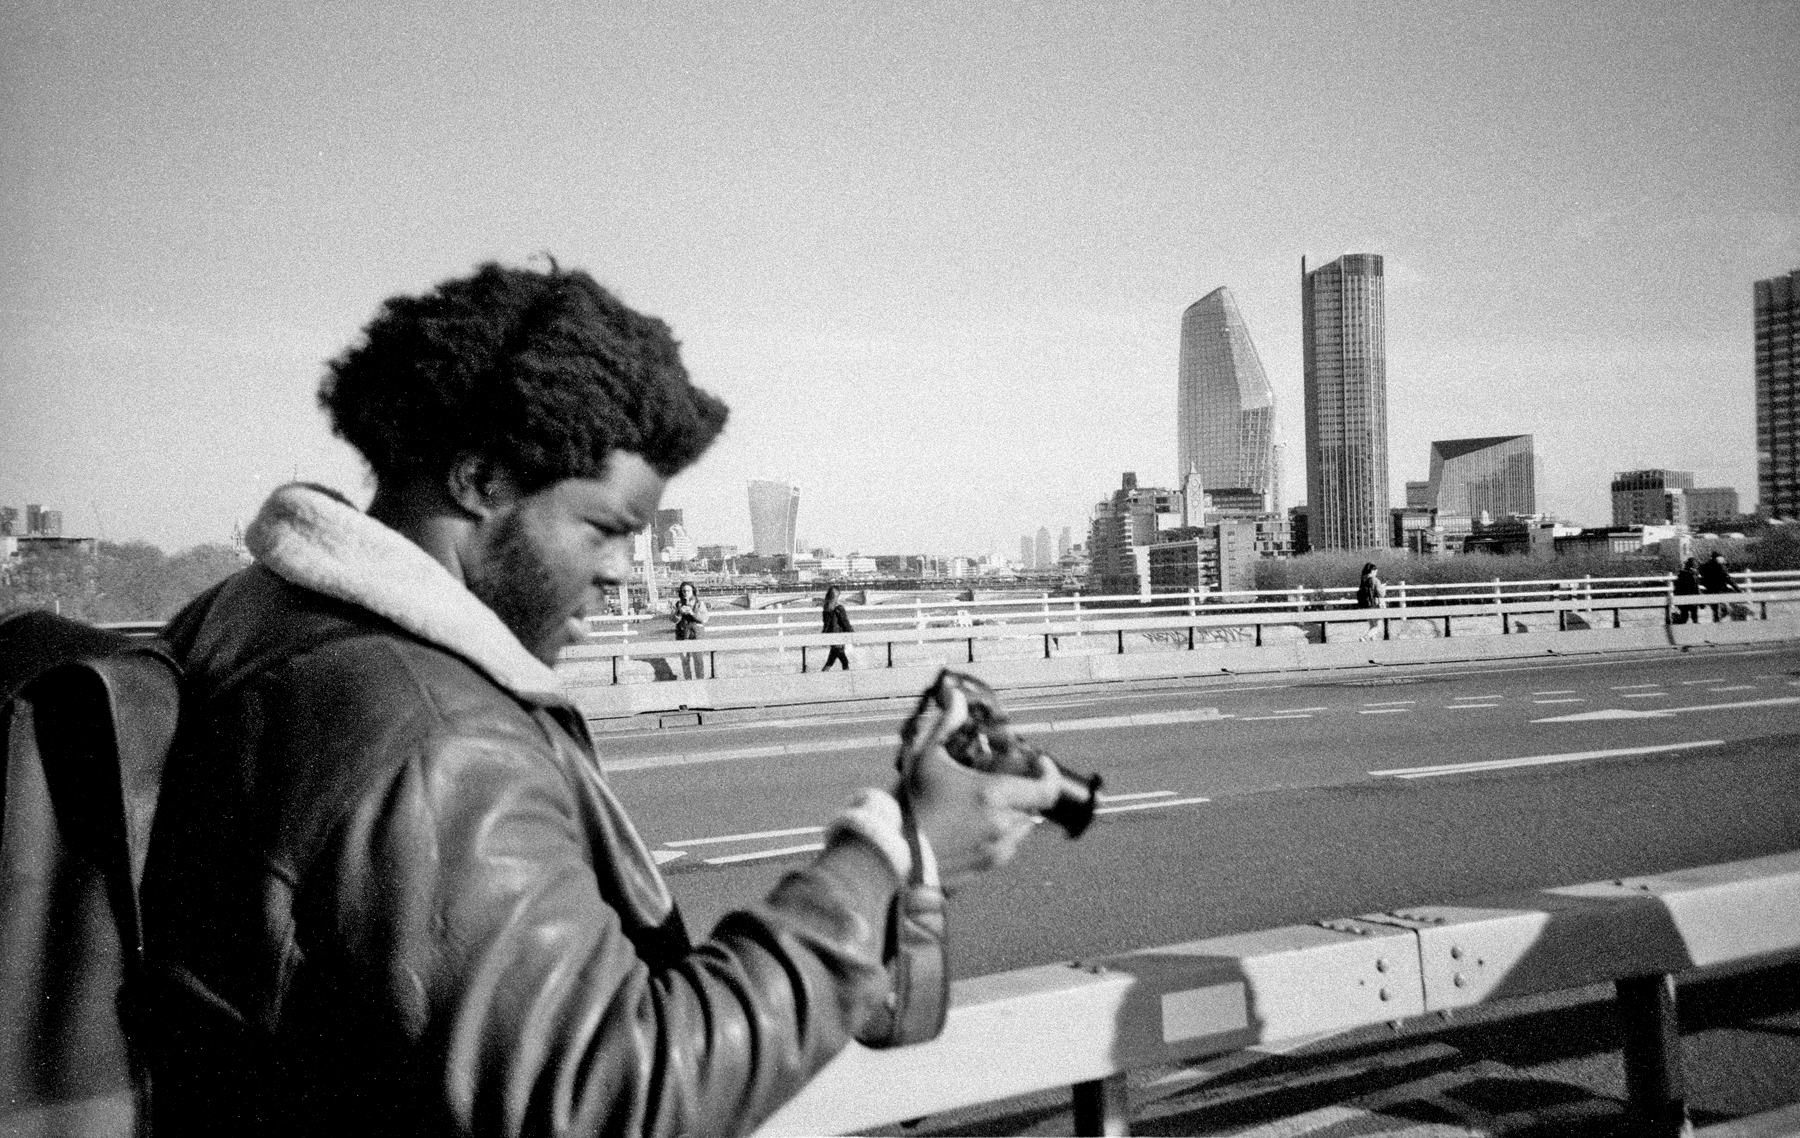 Man checking camera on bridge (Pic: Stephen Dowling)